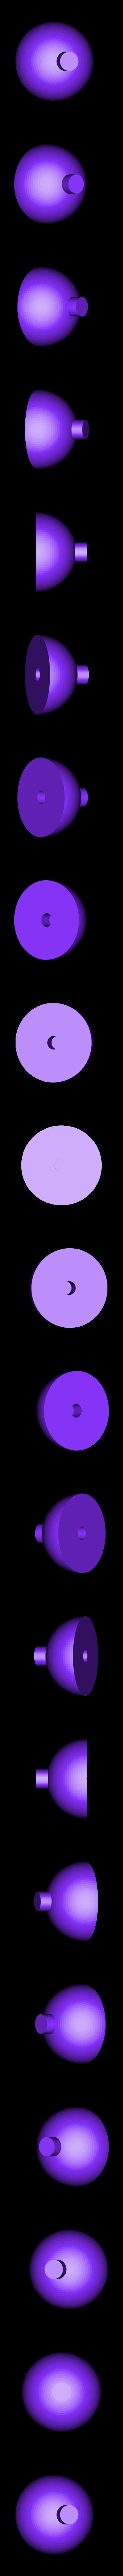 Eye_Ball_Large_B.stl Download free STL file Halloween Glow in the dark wall/door hanger (Skelton) • 3D print object, Pongo